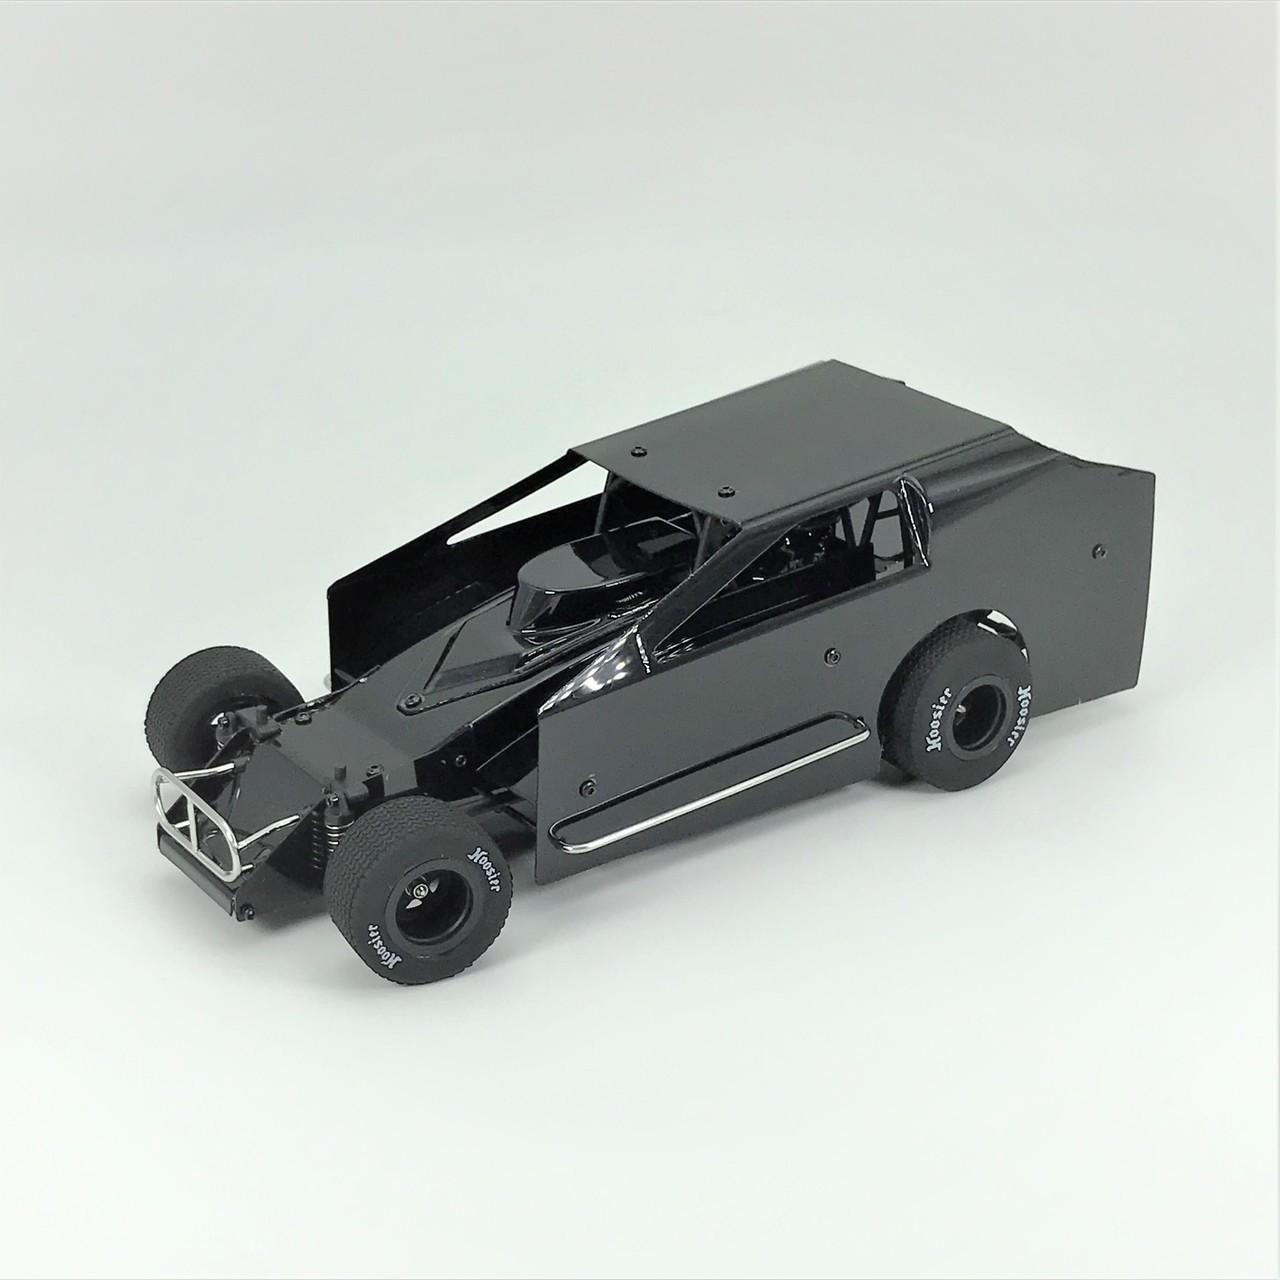 1/18 EDM 2.0, Black, RTR